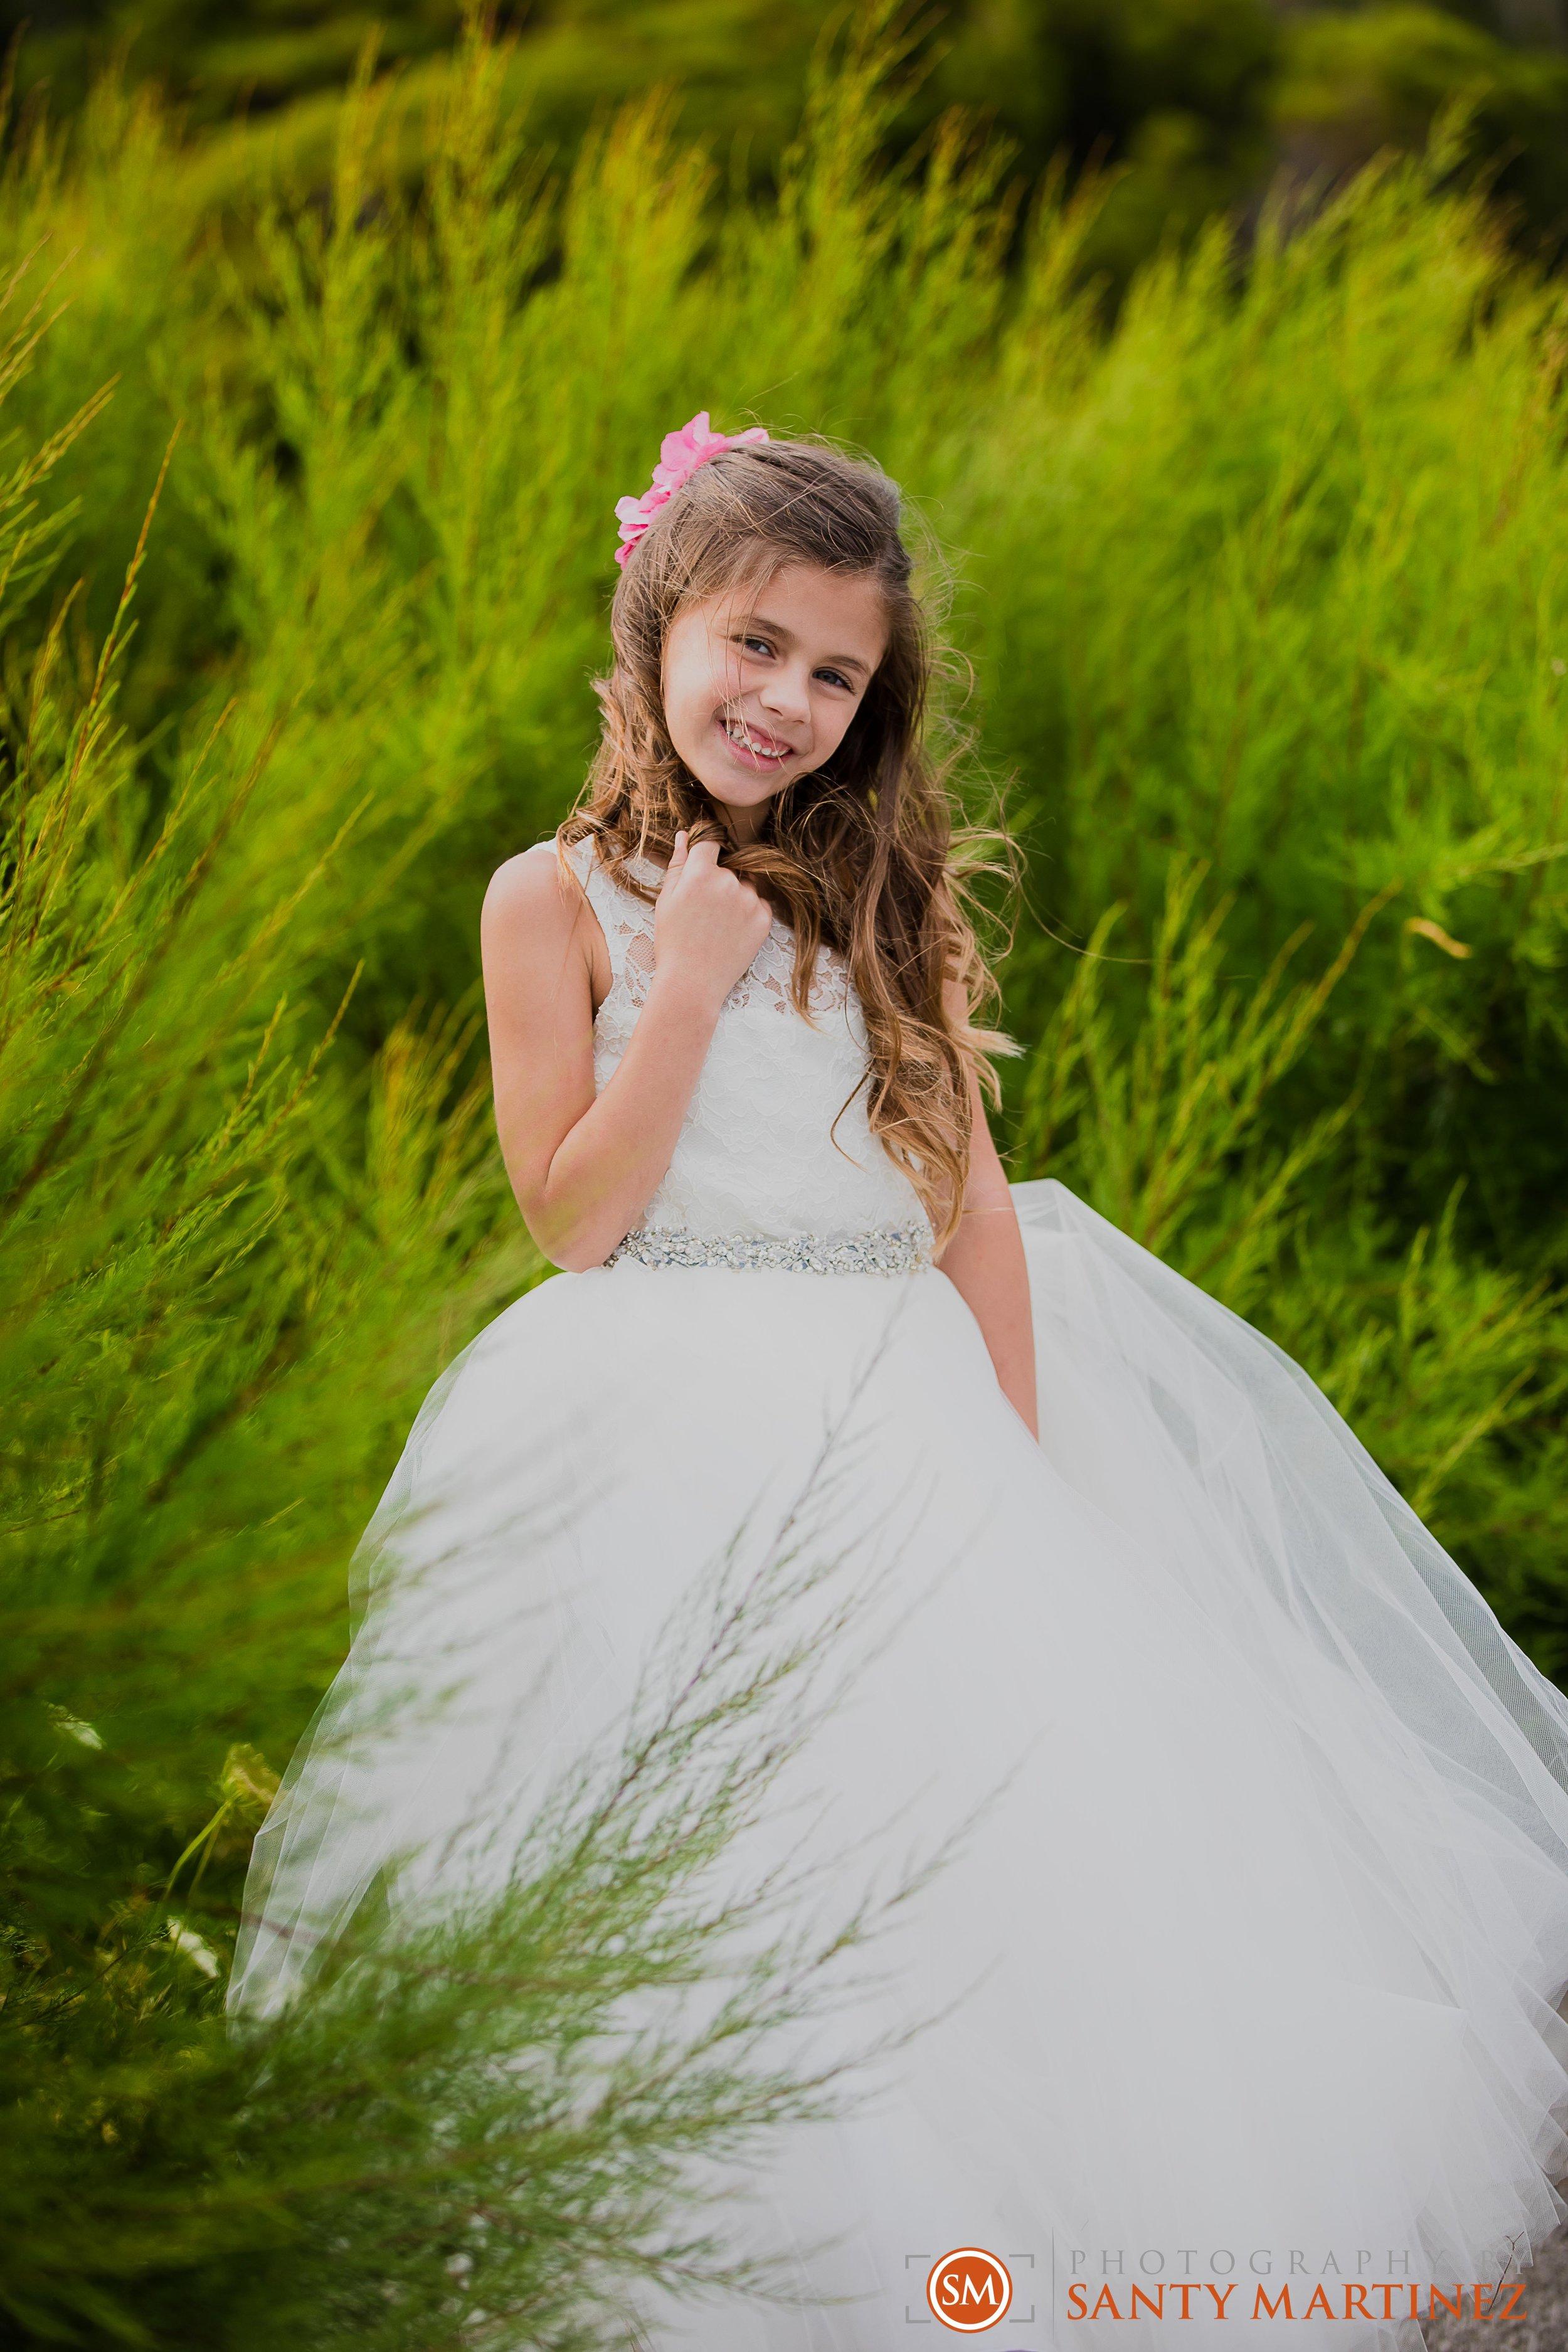 Wedding Capri Italy - Photography by Santy Martinez-37.jpg